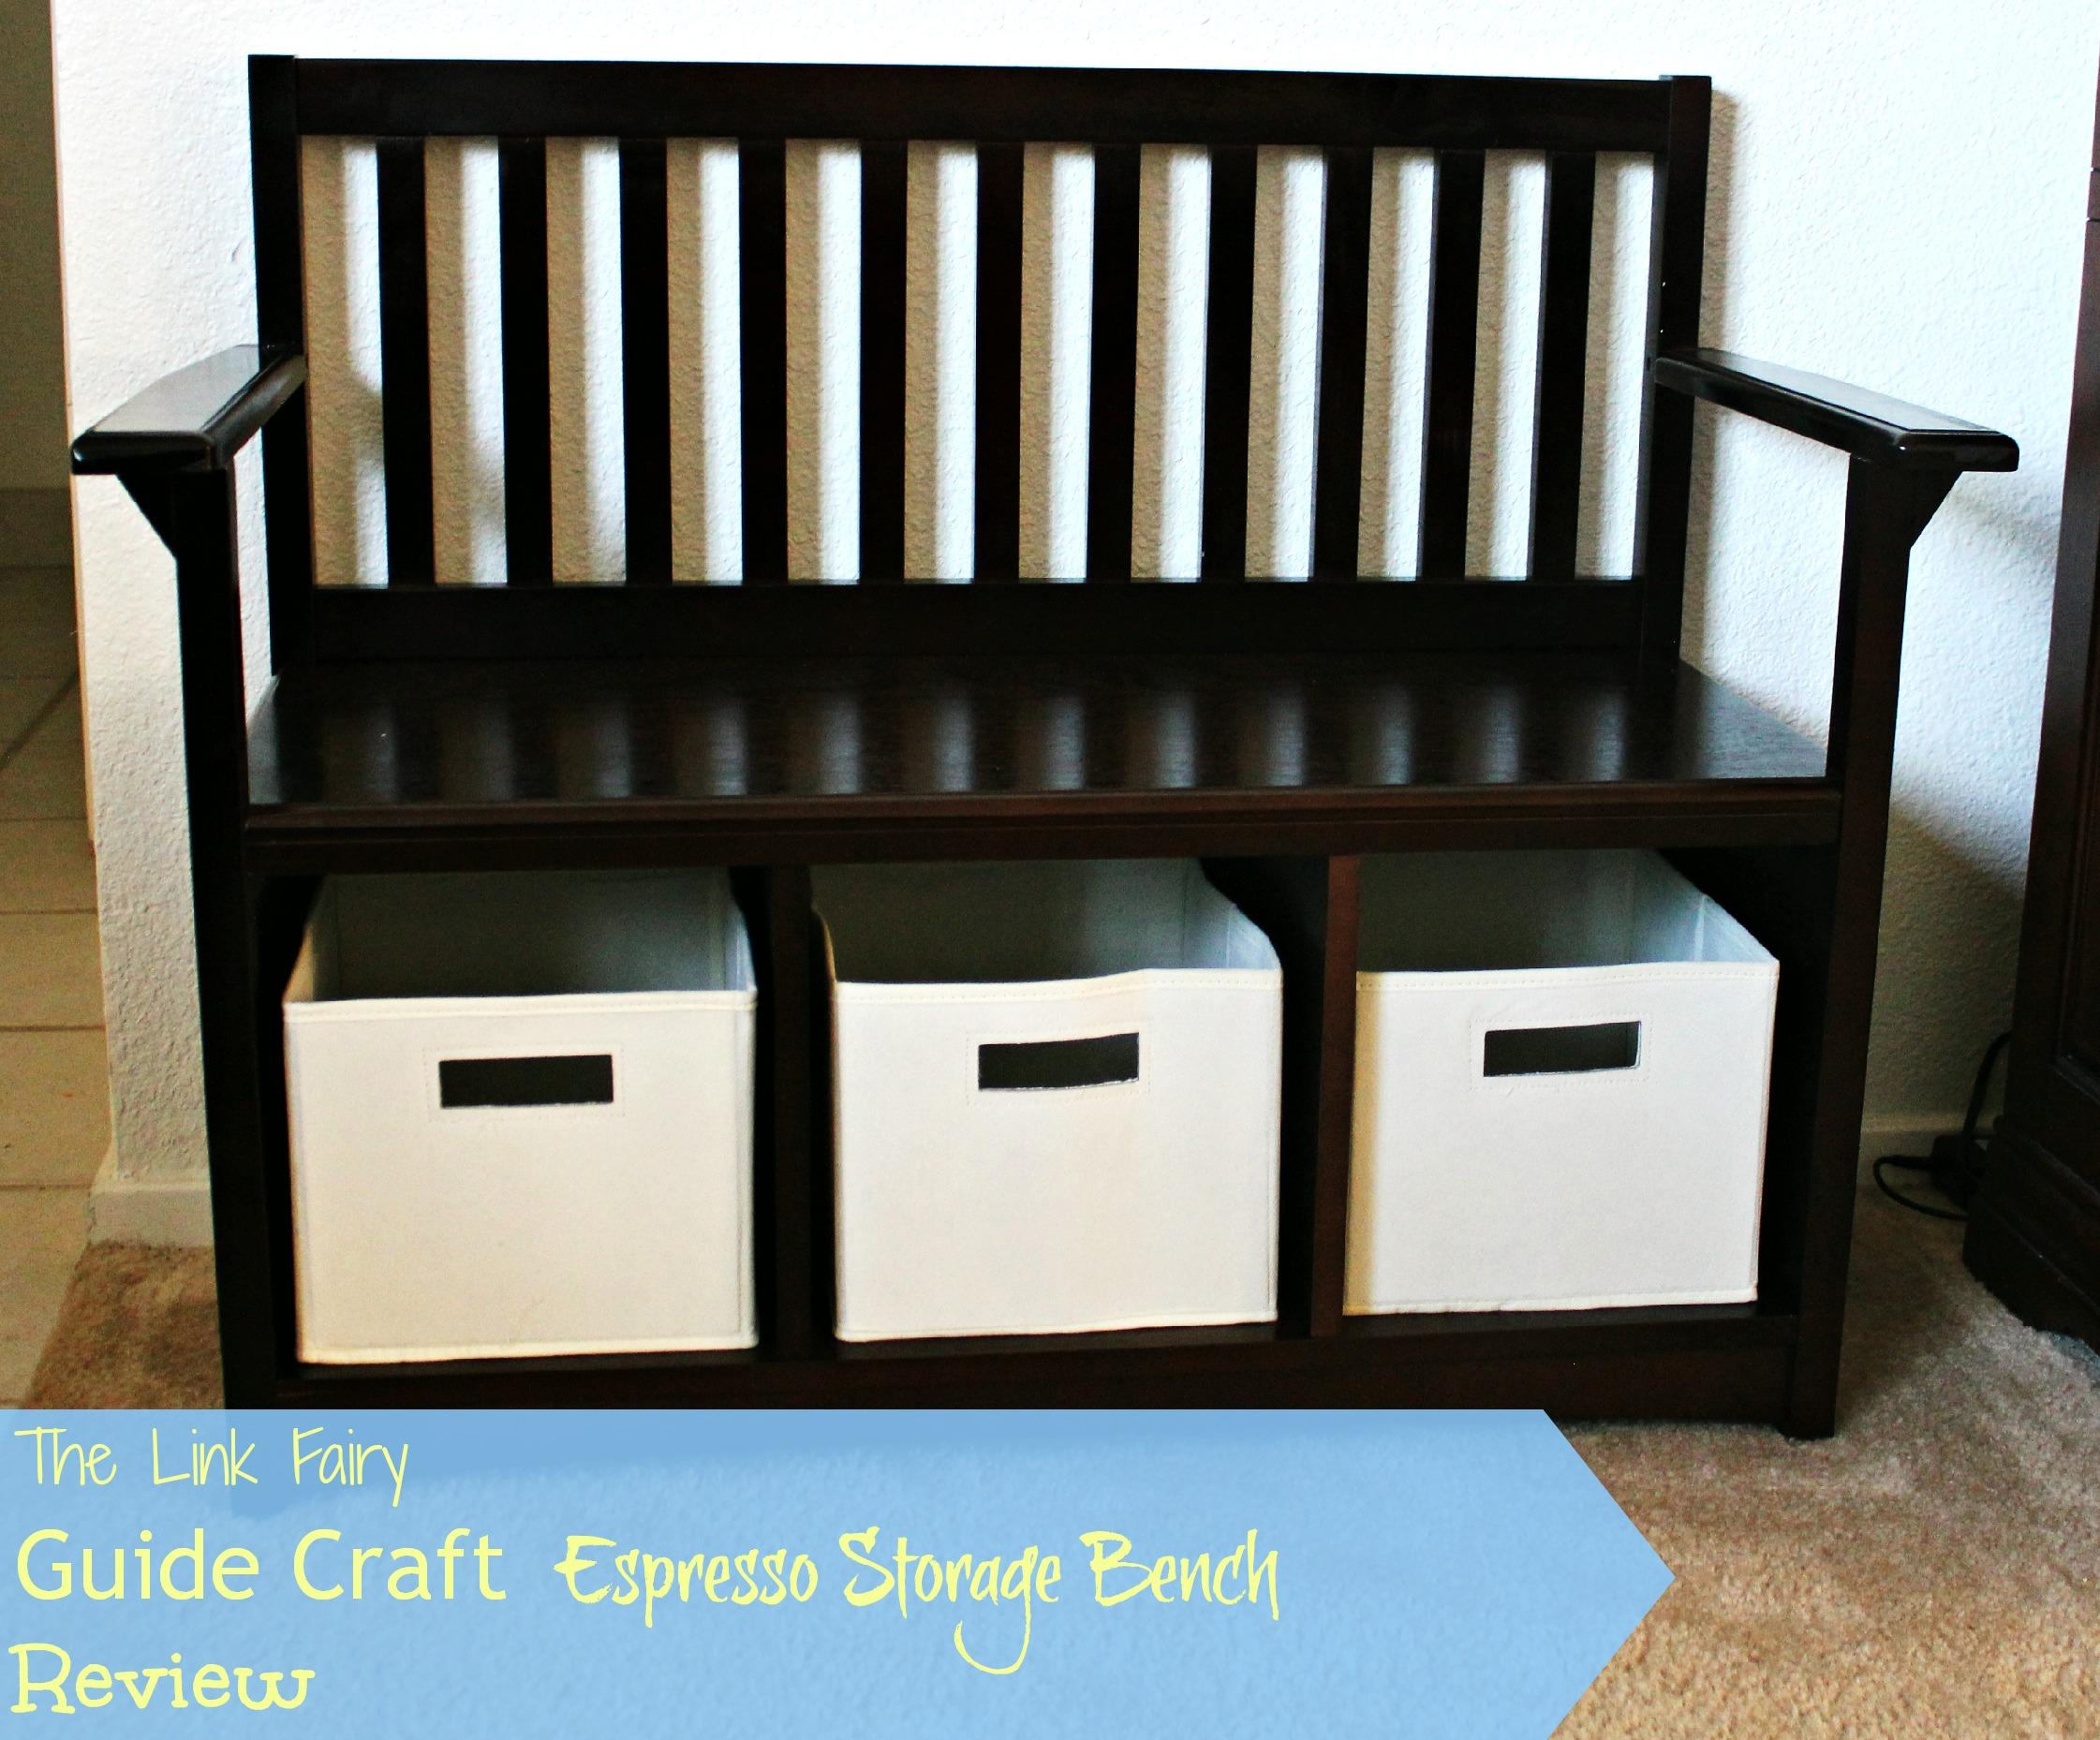 Guide Craft Espresso Storage Bench Review